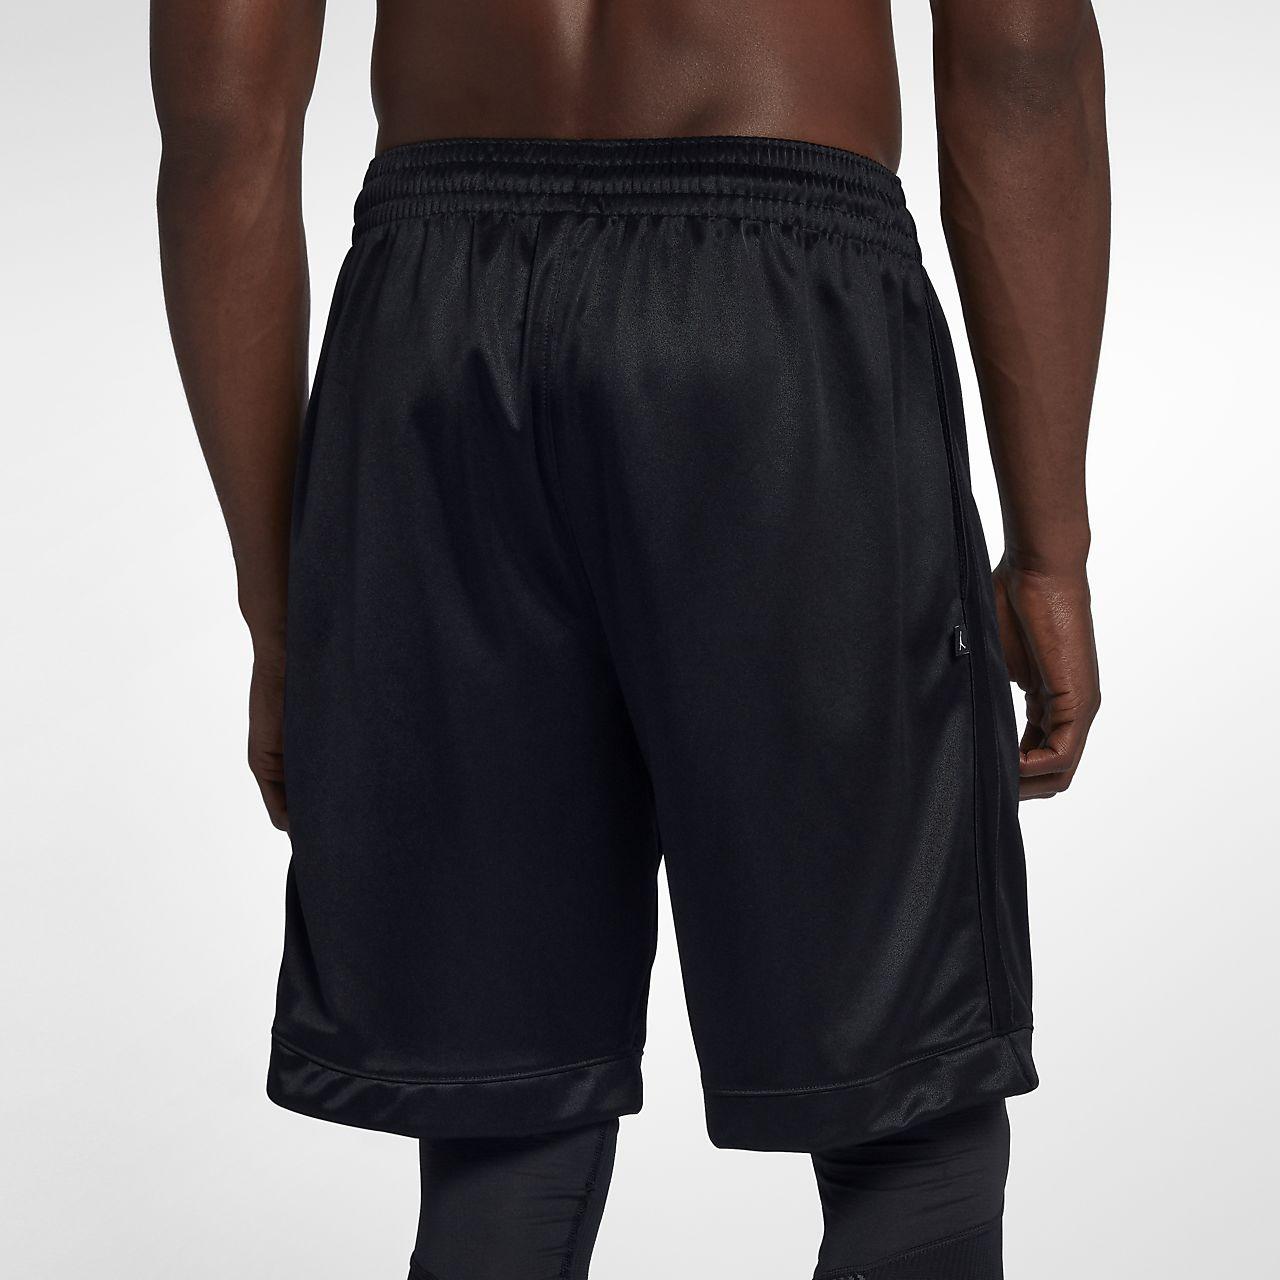 huge discount 93b13 c7be8 Low Resolution Jordan Shimmer Men s Basketball Shorts Jordan Shimmer Men s  Basketball Shorts